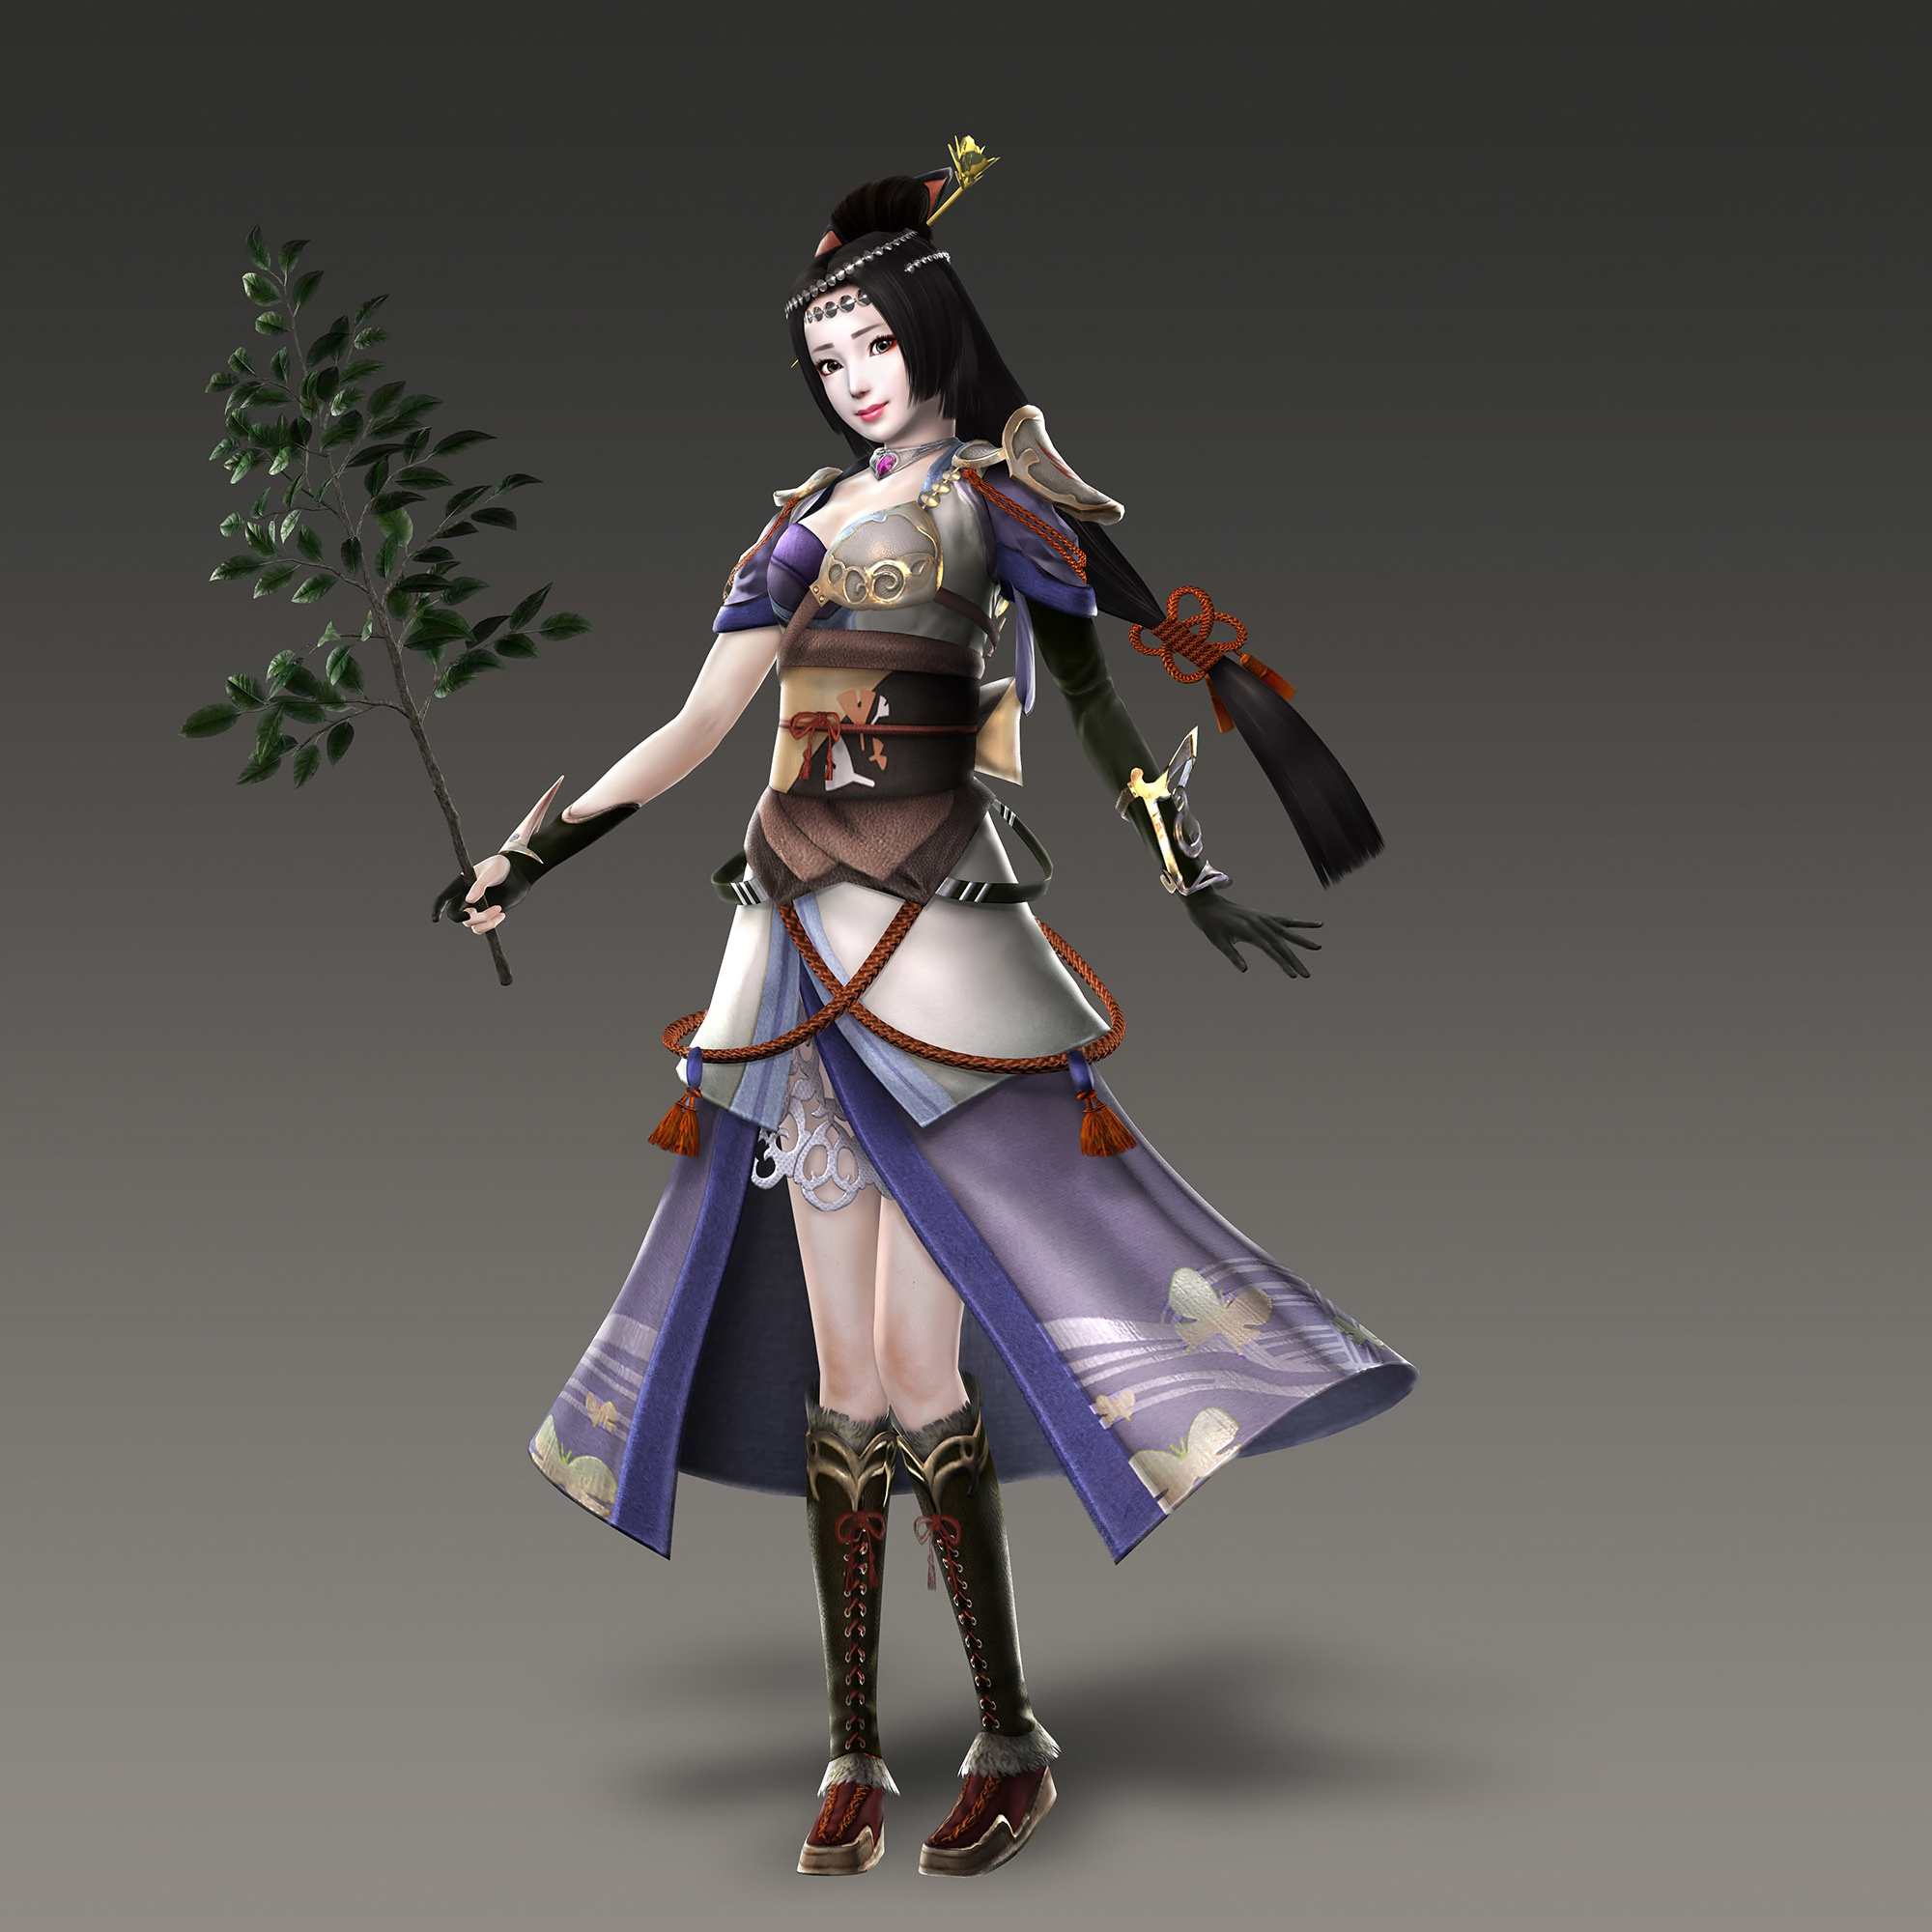 Warriors Orochi 3 Ultimate Gameplay: Image - Kaguya Toukiden Costume (WO3U DLC).jpg